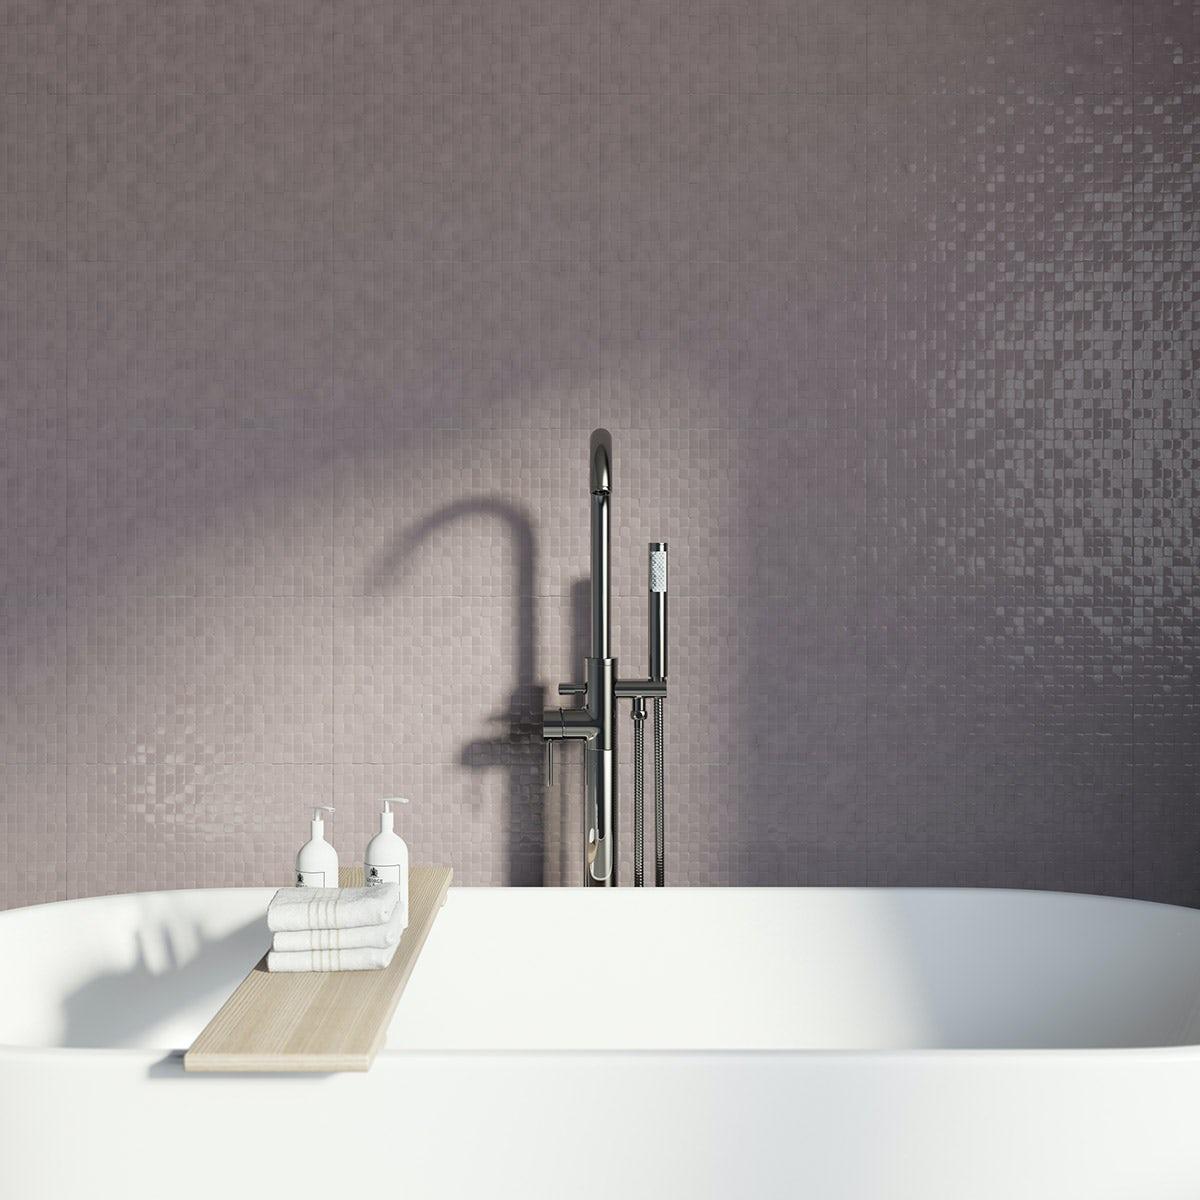 Studio Conran hartland poise pressed mosaic tile 248mm x 398mm